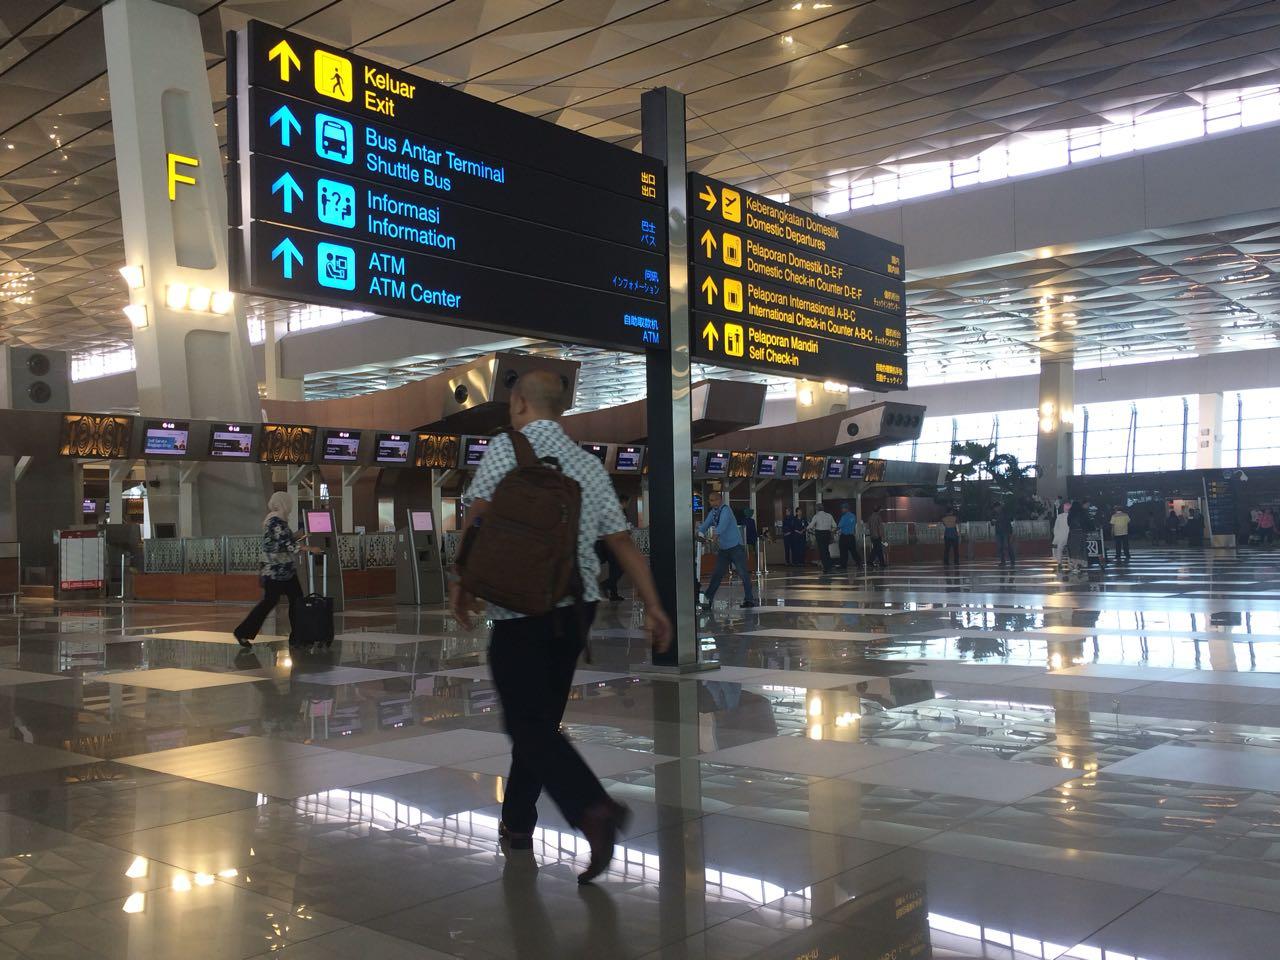 https: img.okezone.com content 2020 06 08 320 2226181 bandara-sepi-selama-covid-19-pendapatan-damri-anjlok-90-Qblmf84LNw.jpg